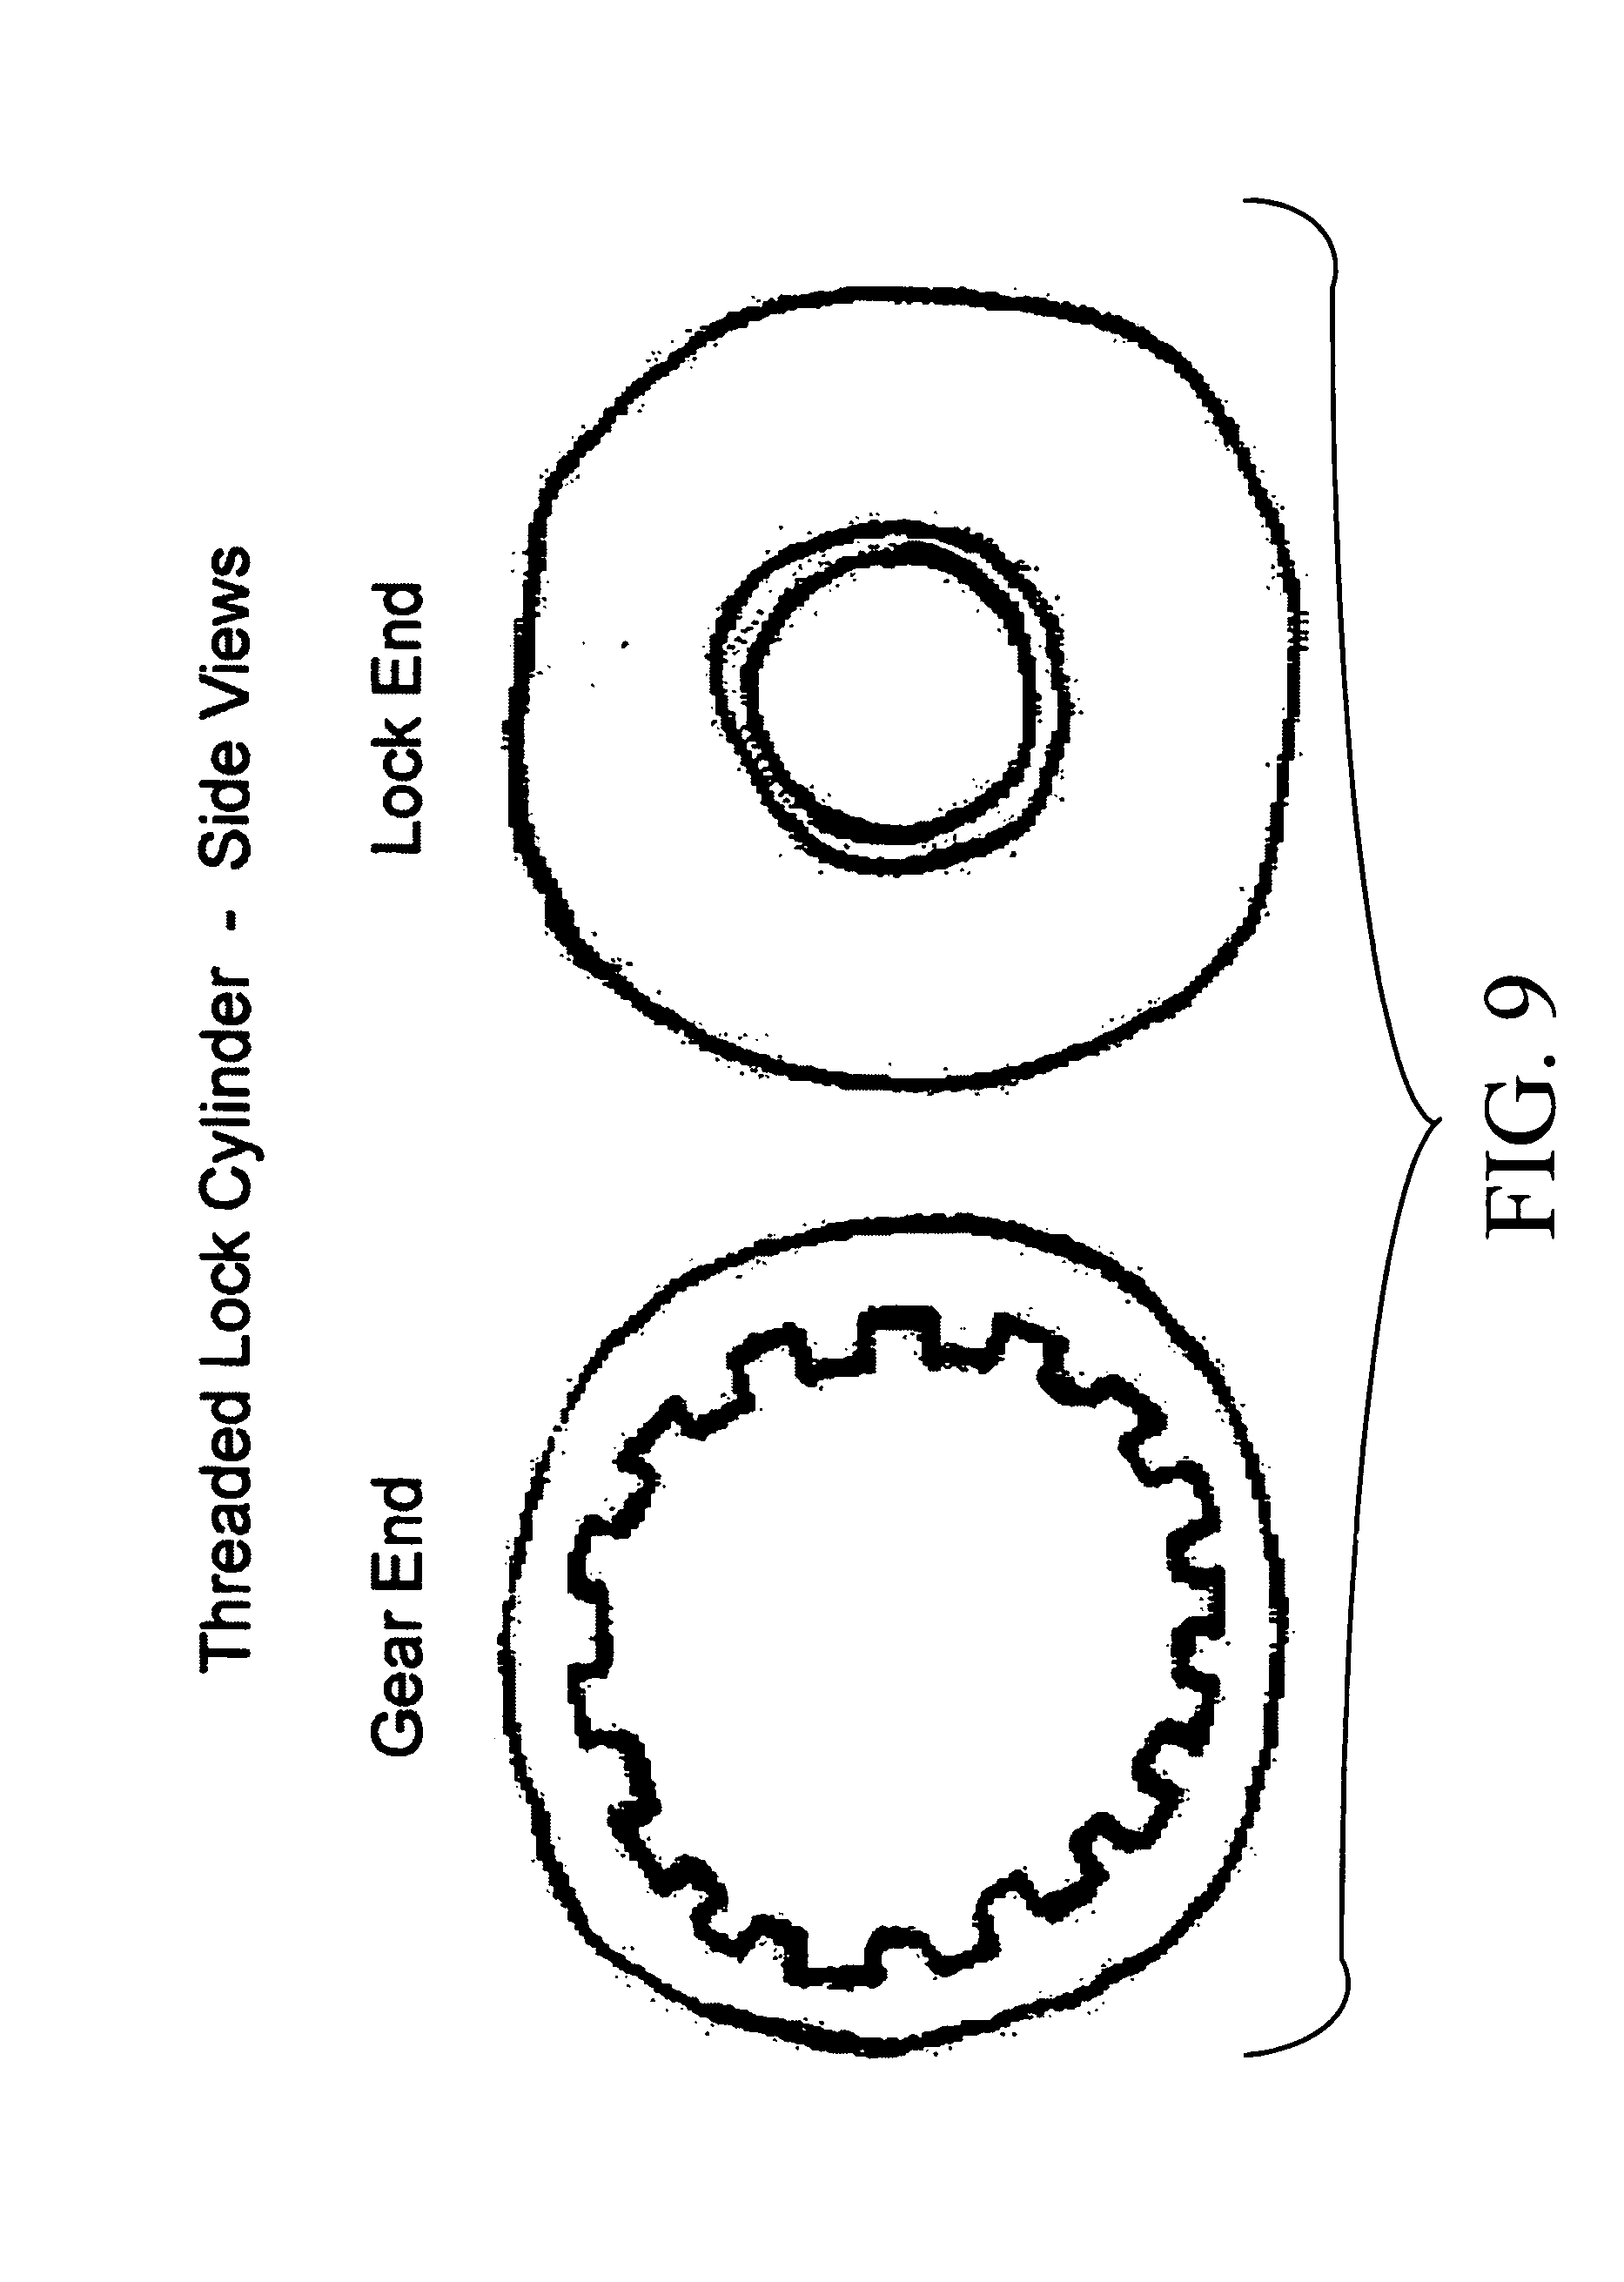 integra type r engine bay